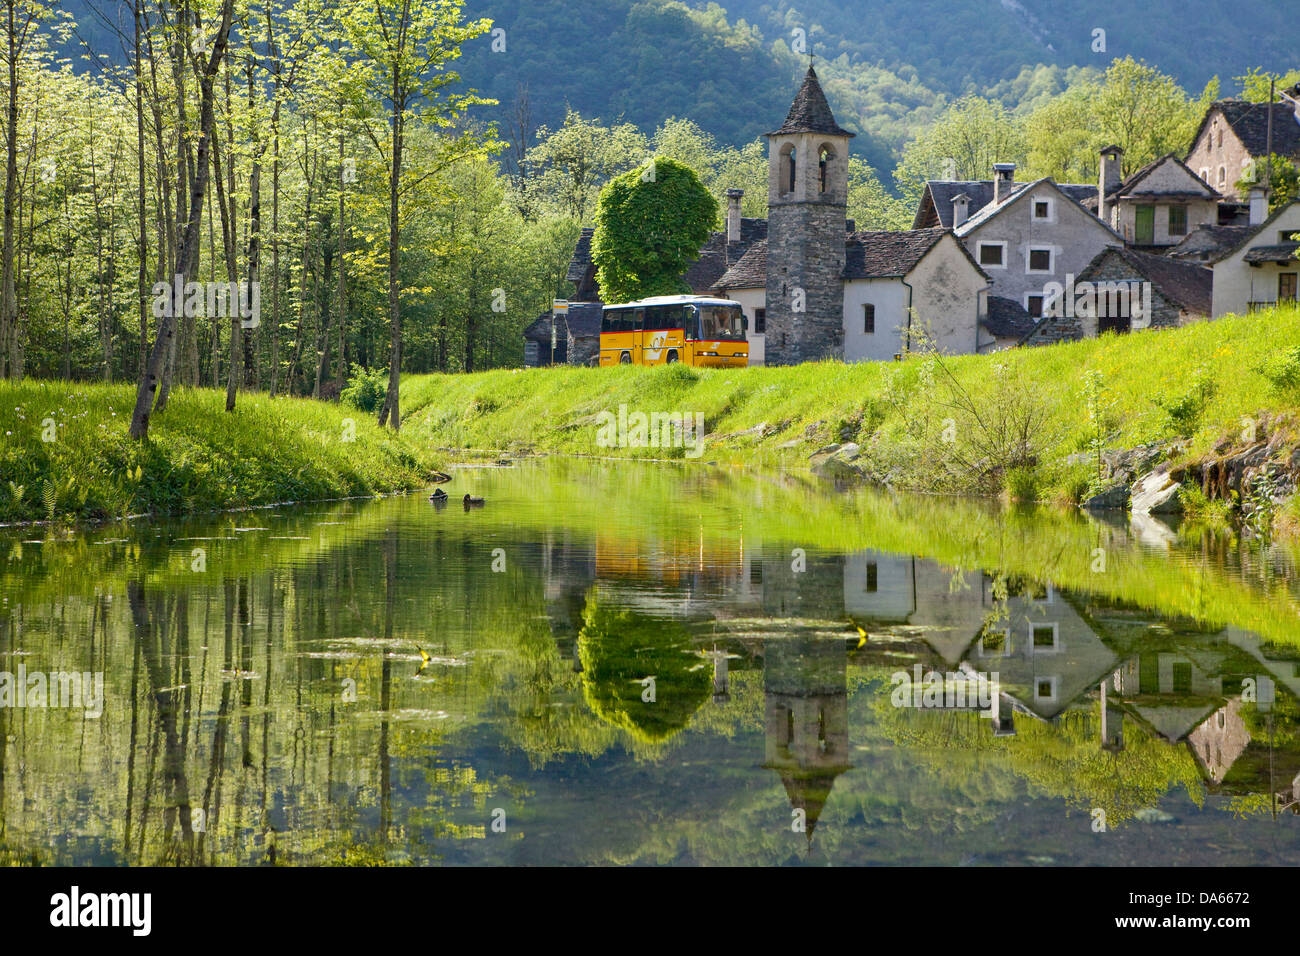 Postal car, Bavona valley, canton, TI, Ticino, South Switzerland, village, postal car, reflection, Switzerland, Stock Photo